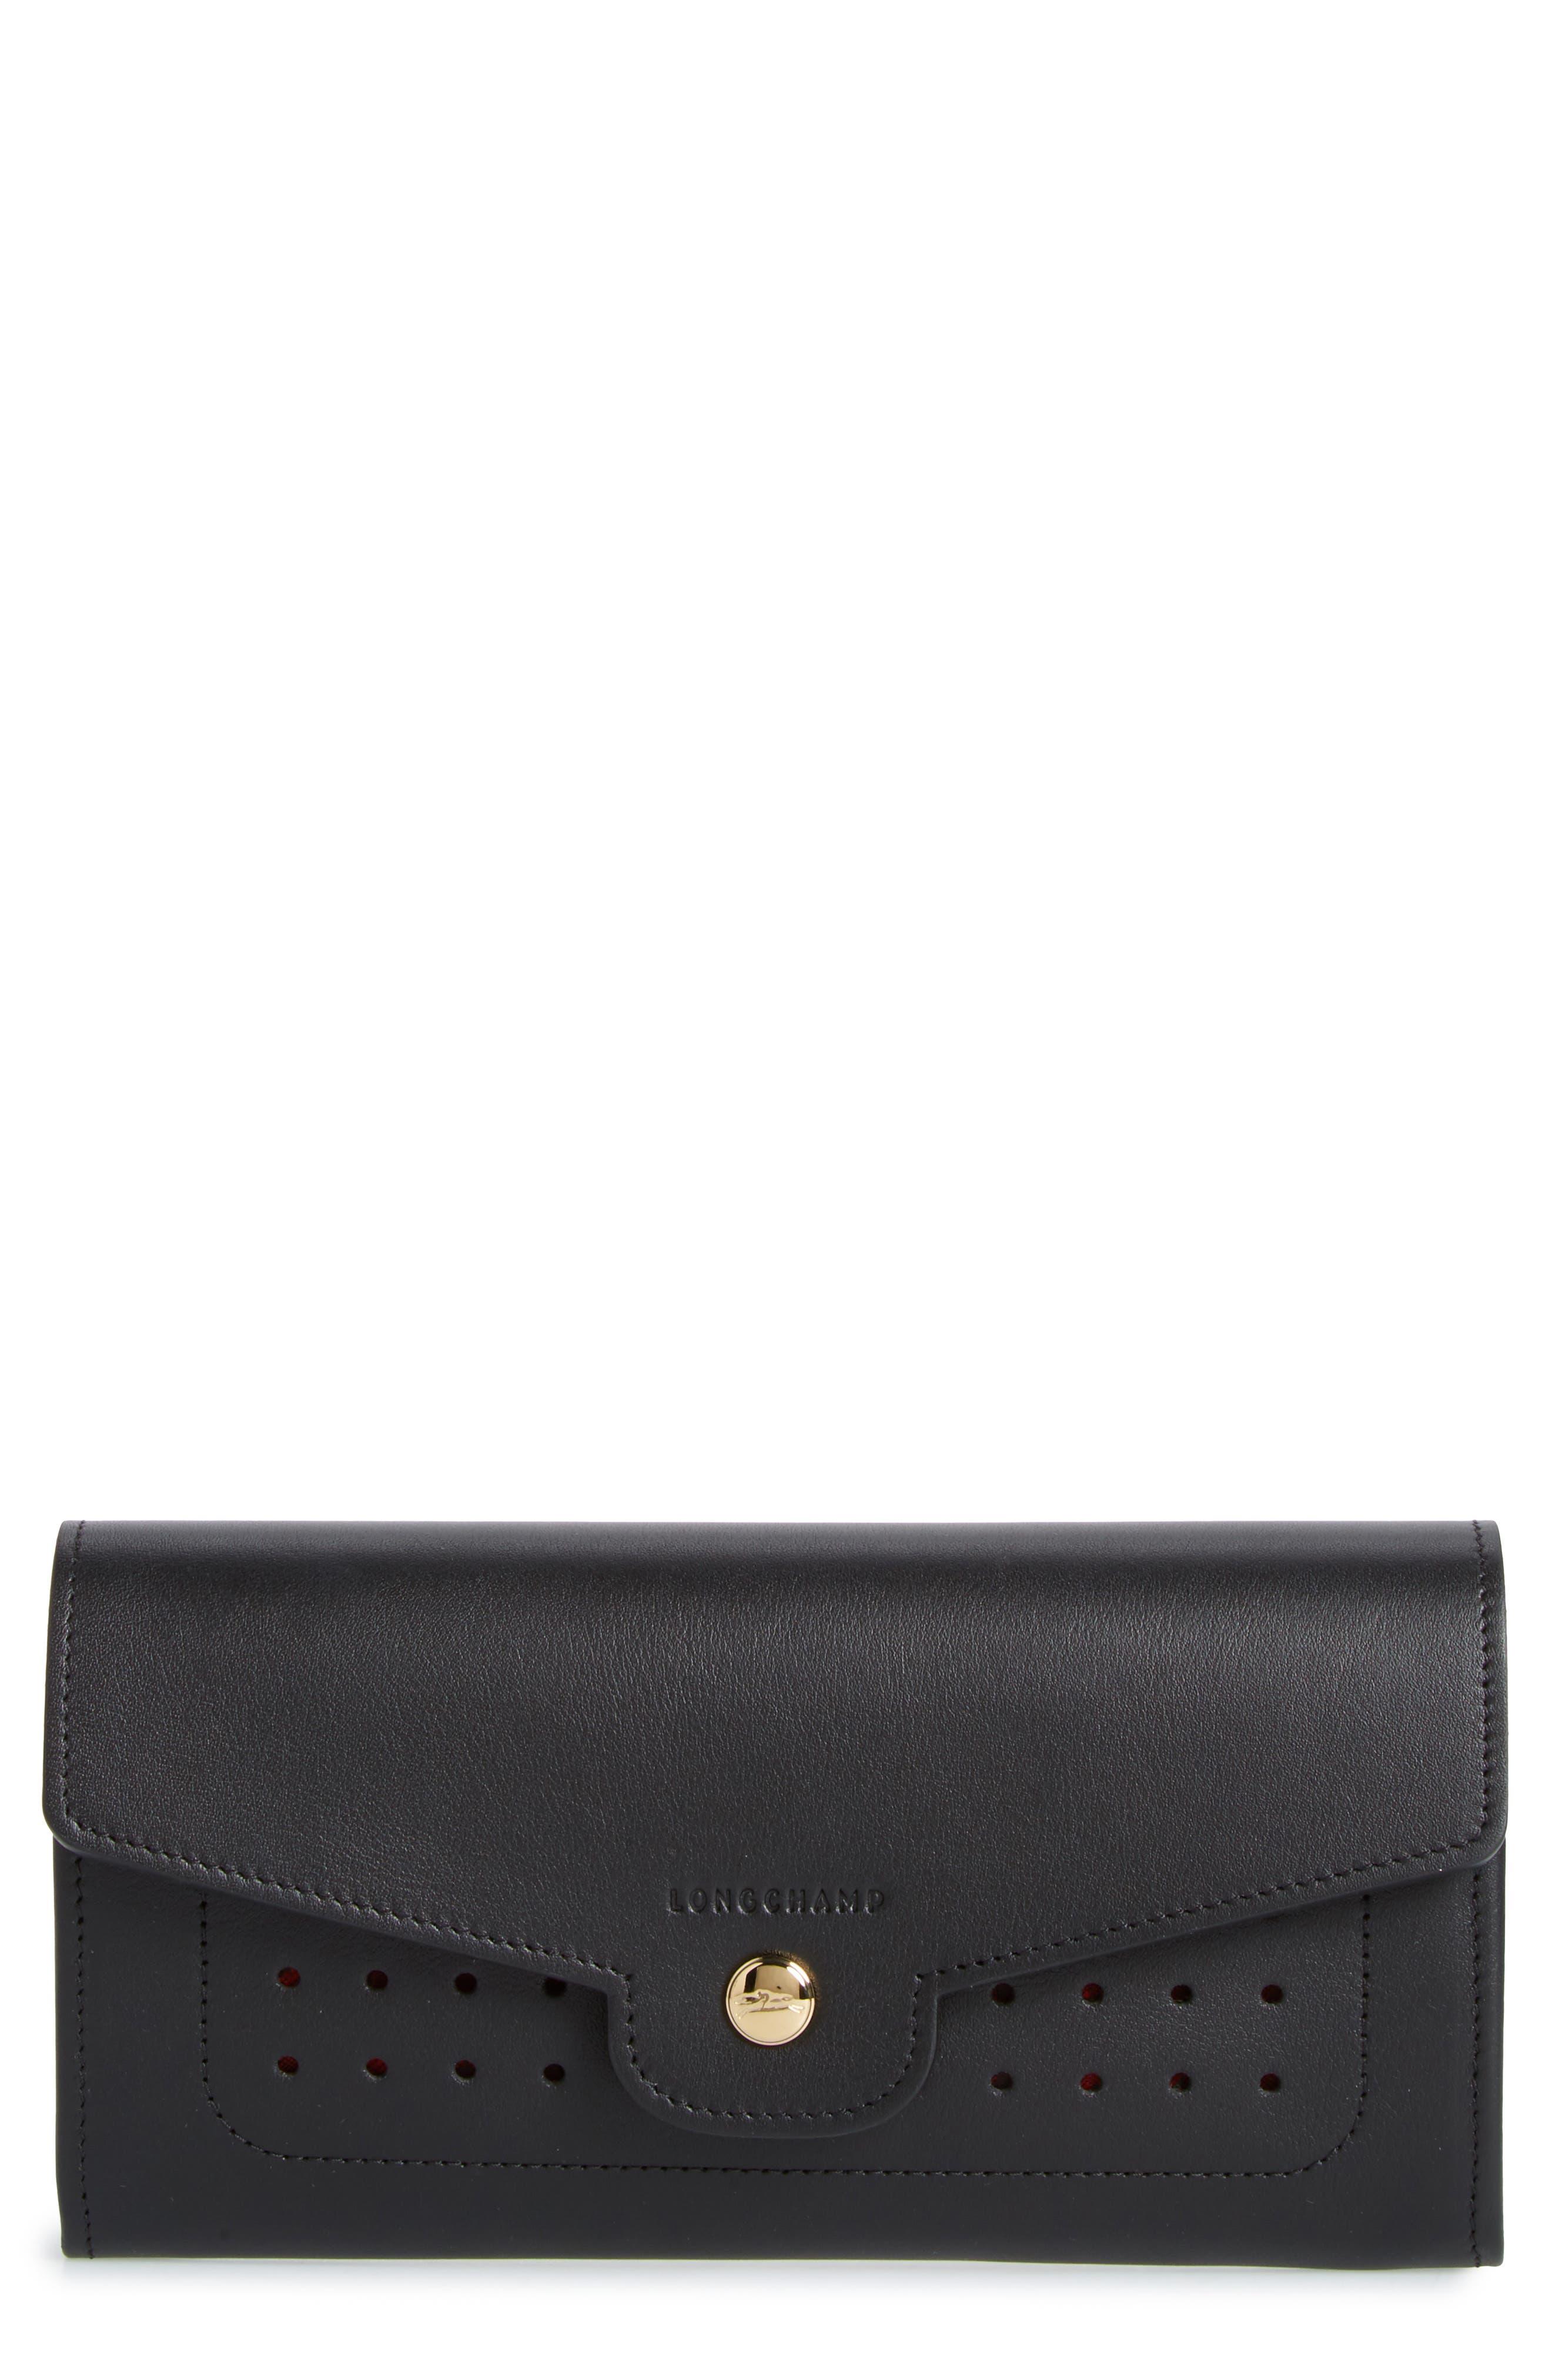 Longchamp Mademoiselle Calfskin Leather Wallet